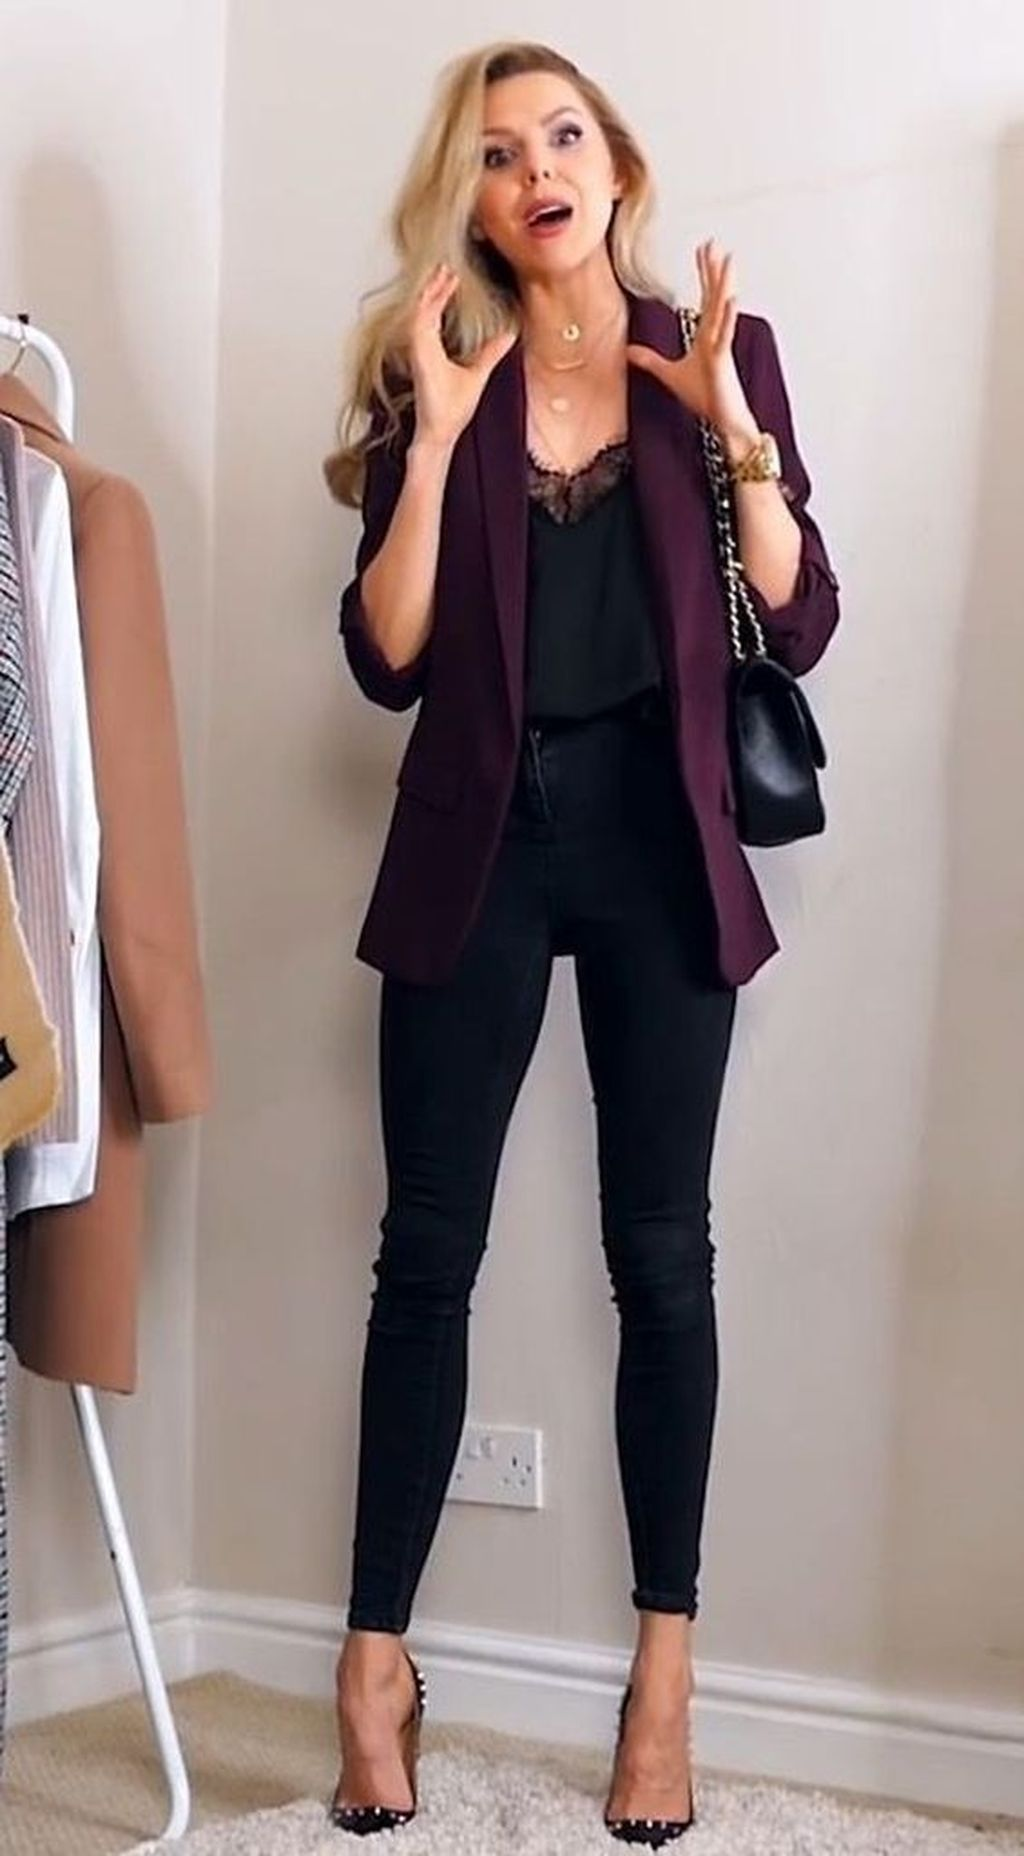 20+ Lovely Winter Work Outfits Ideas For Women 2019 #businessattire